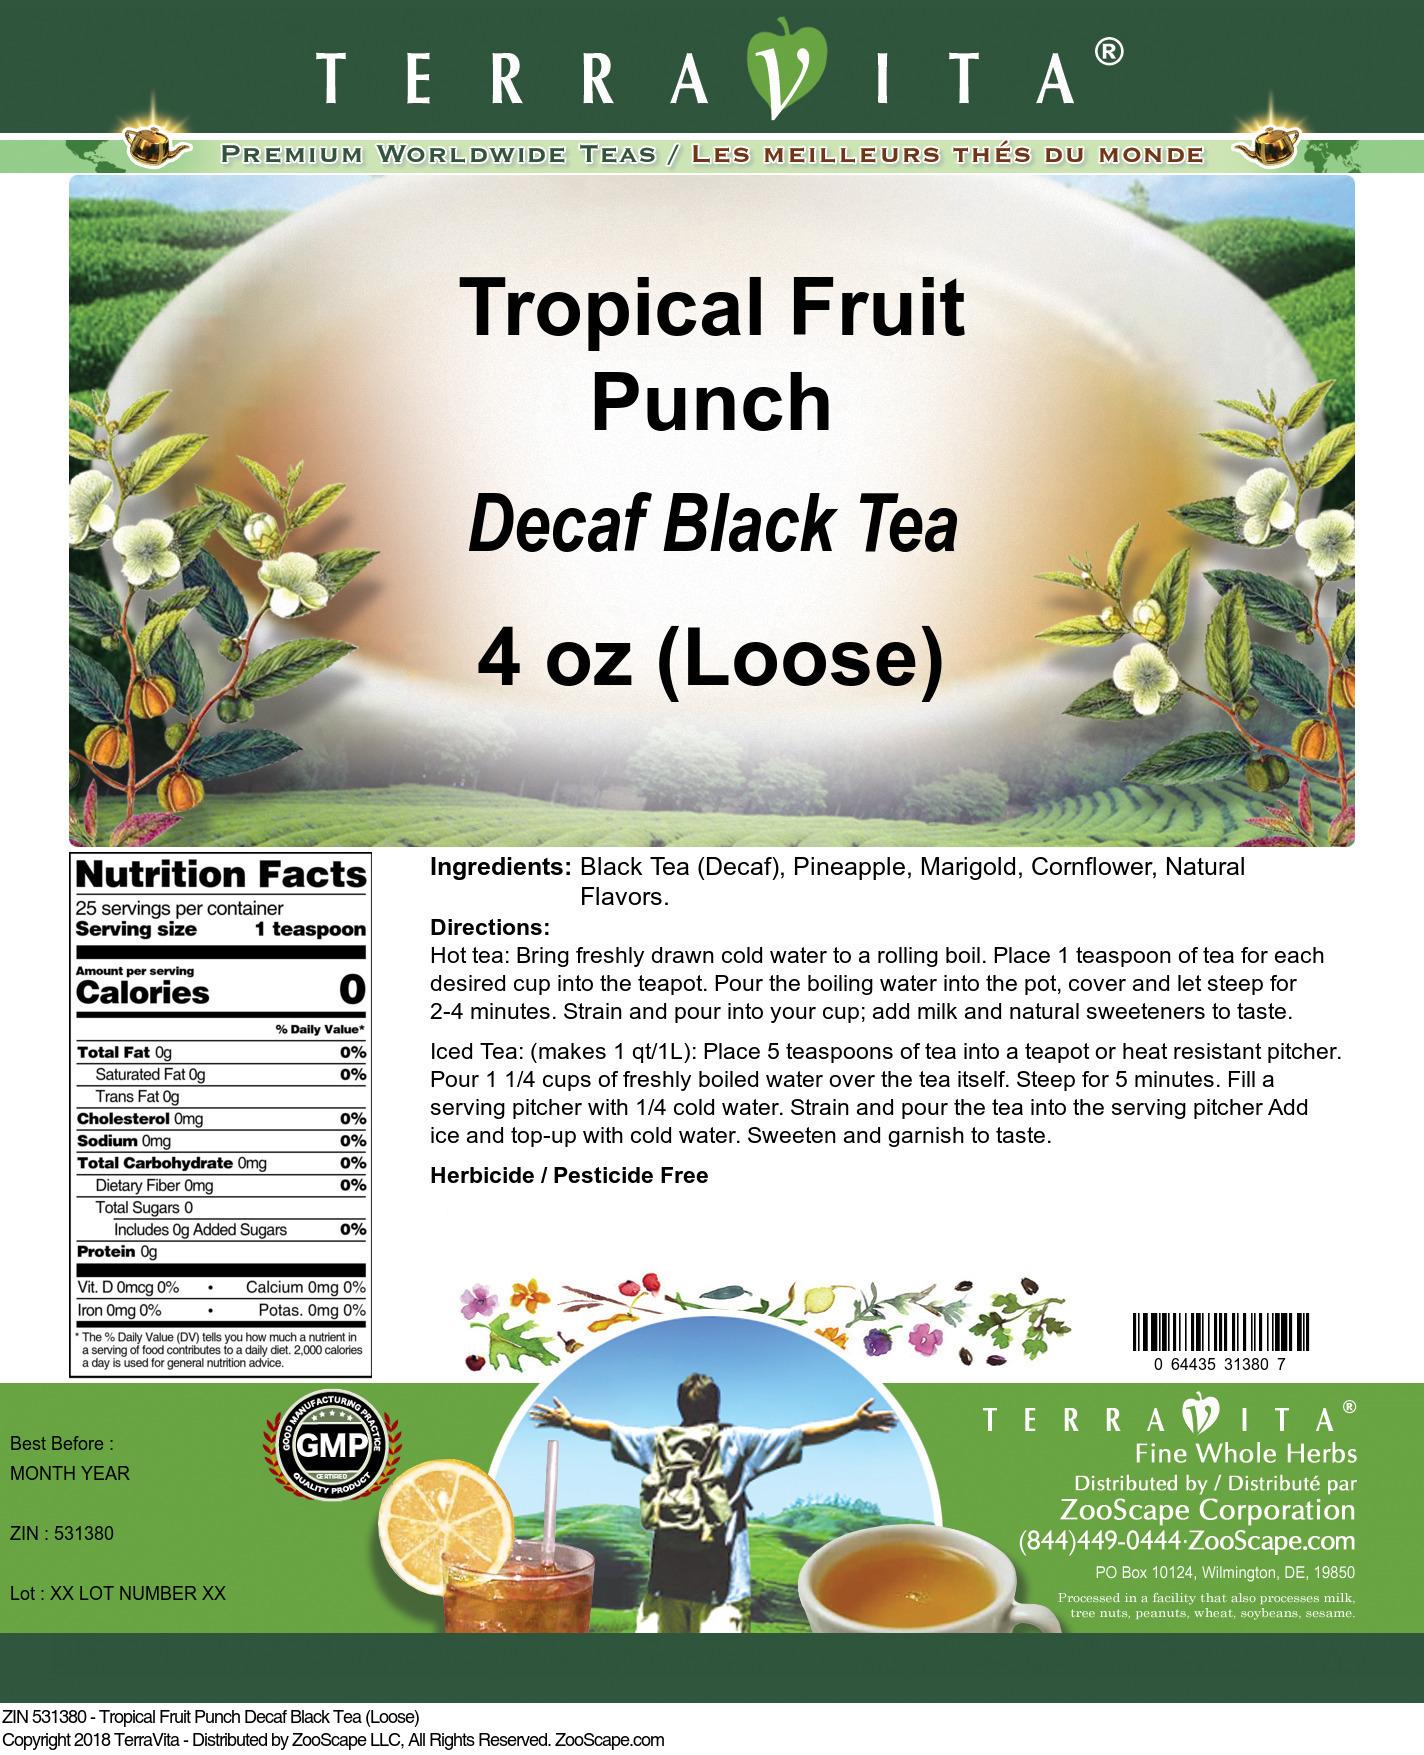 Tropical Fruit Punch Decaf Black Tea (Loose)